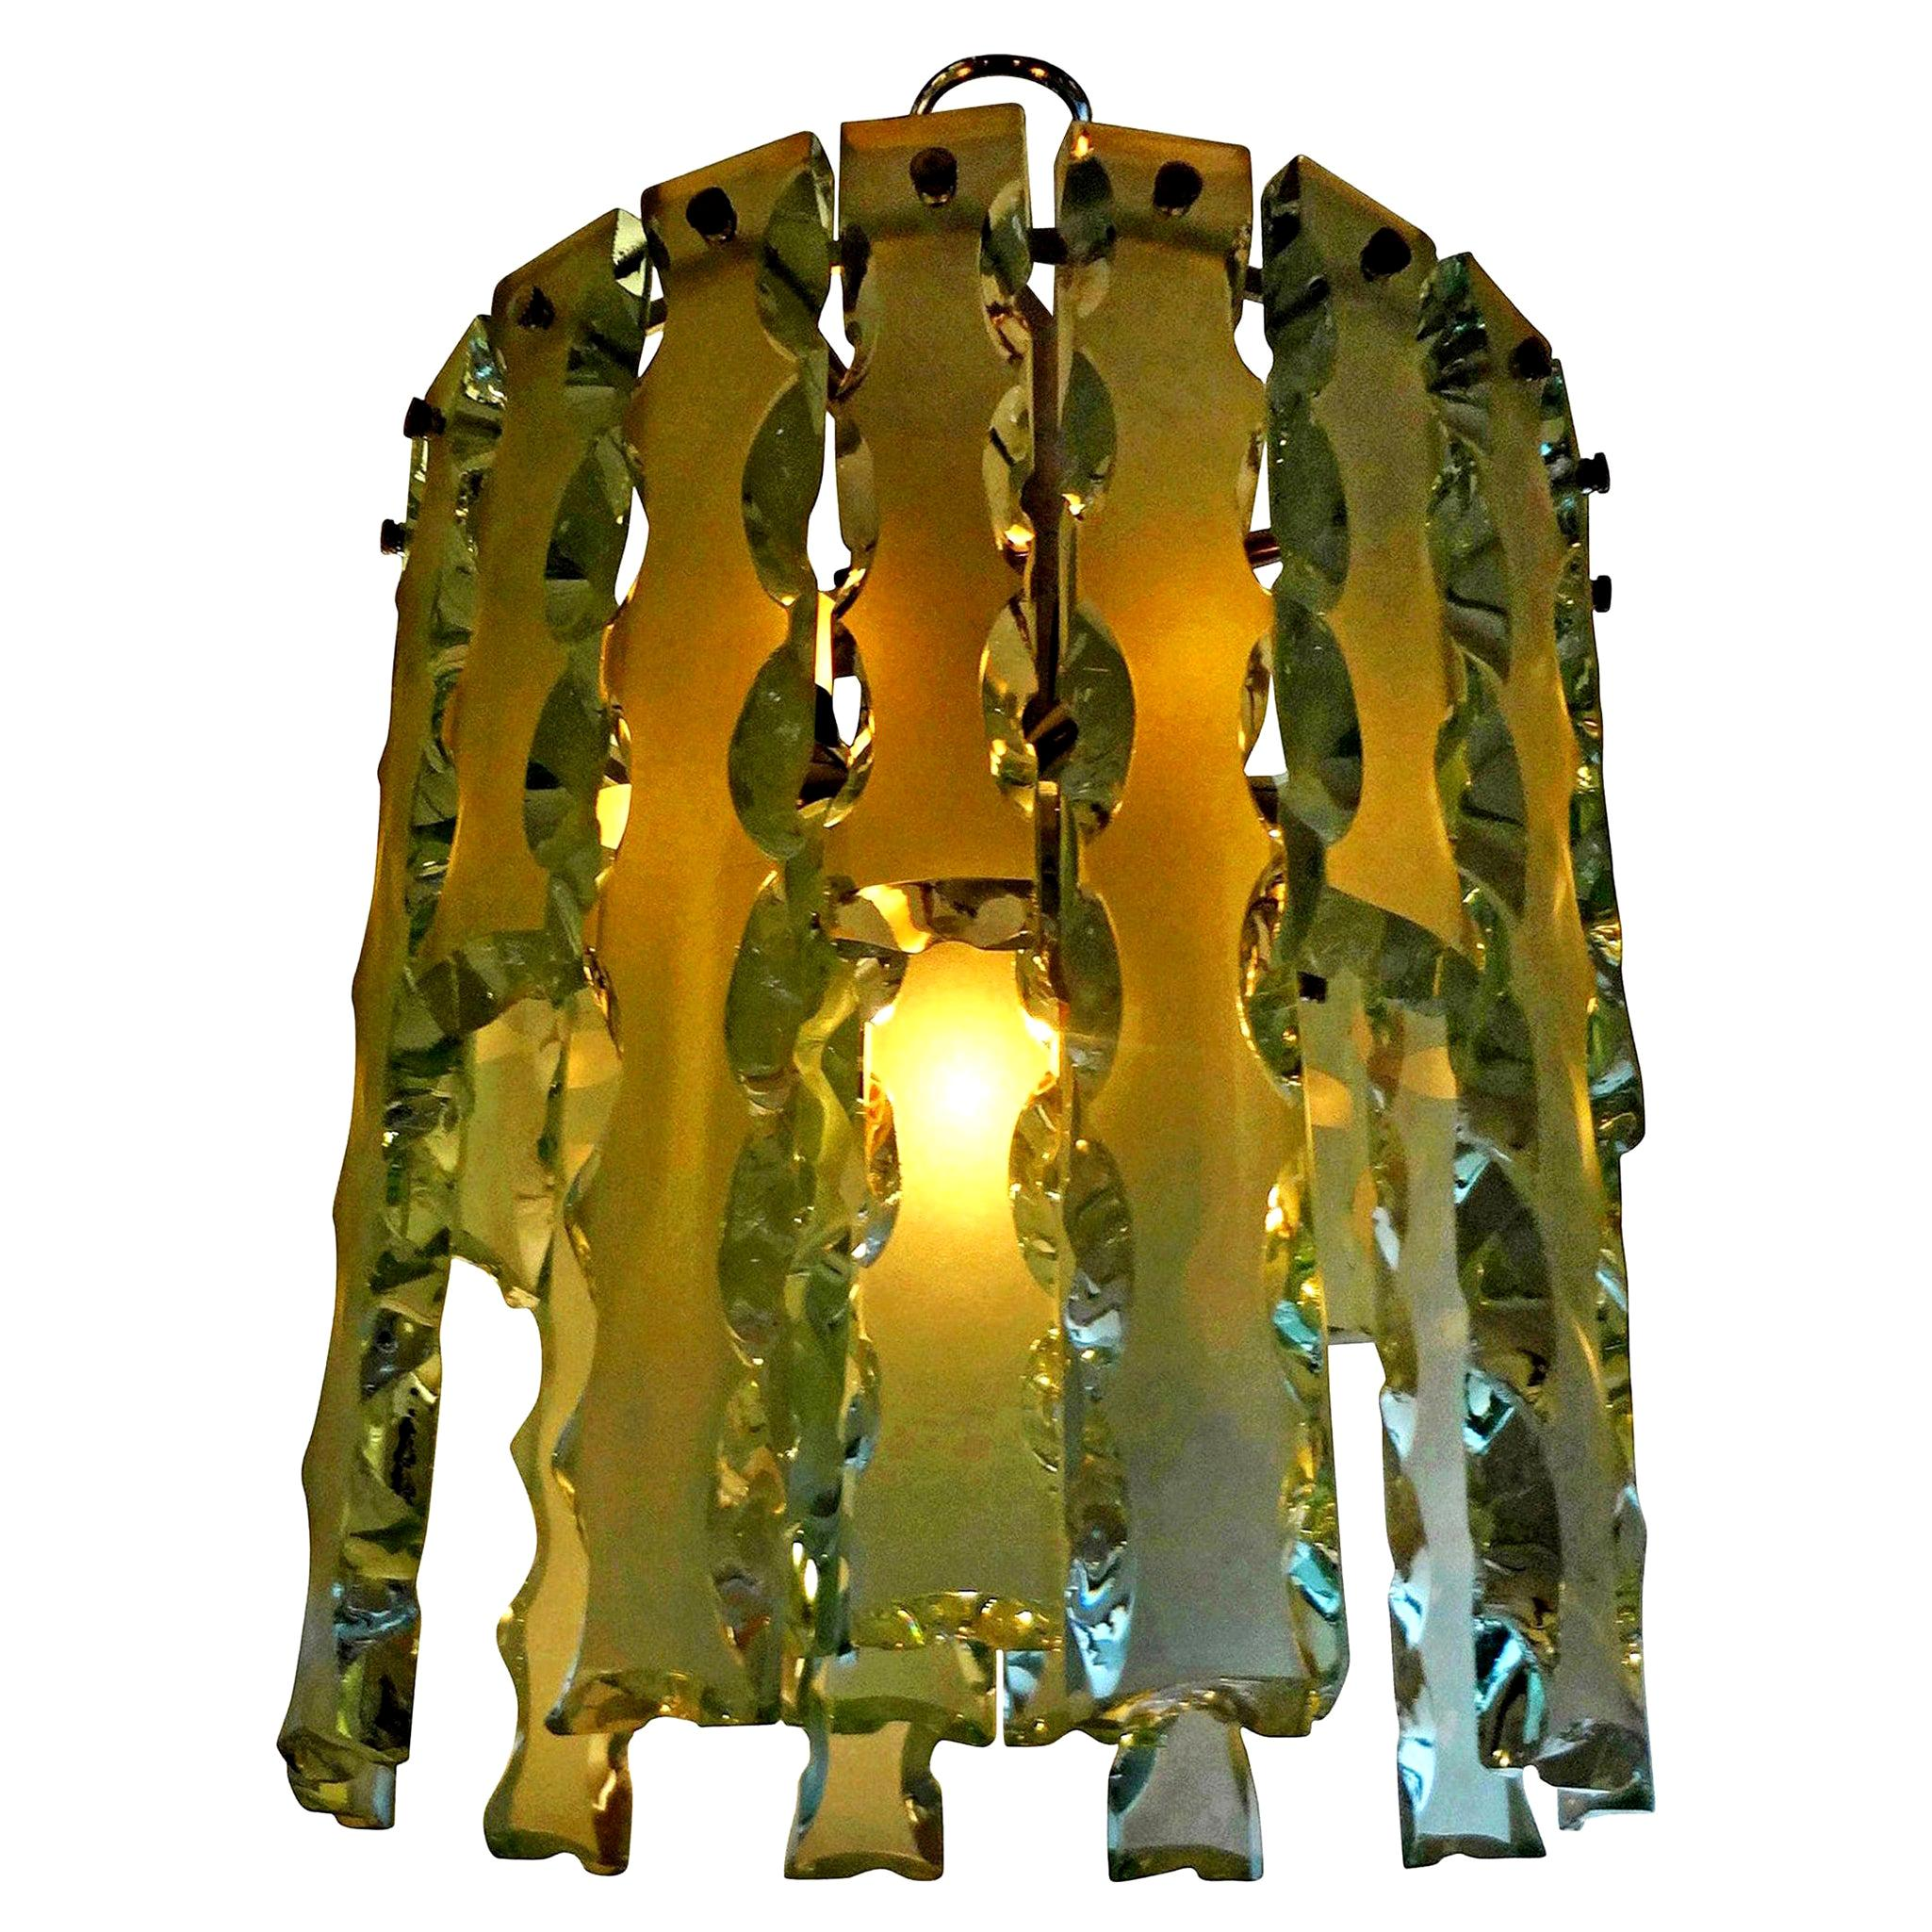 Italian Zero Quattro-Fontana Arte Frosted Glass Chandelier